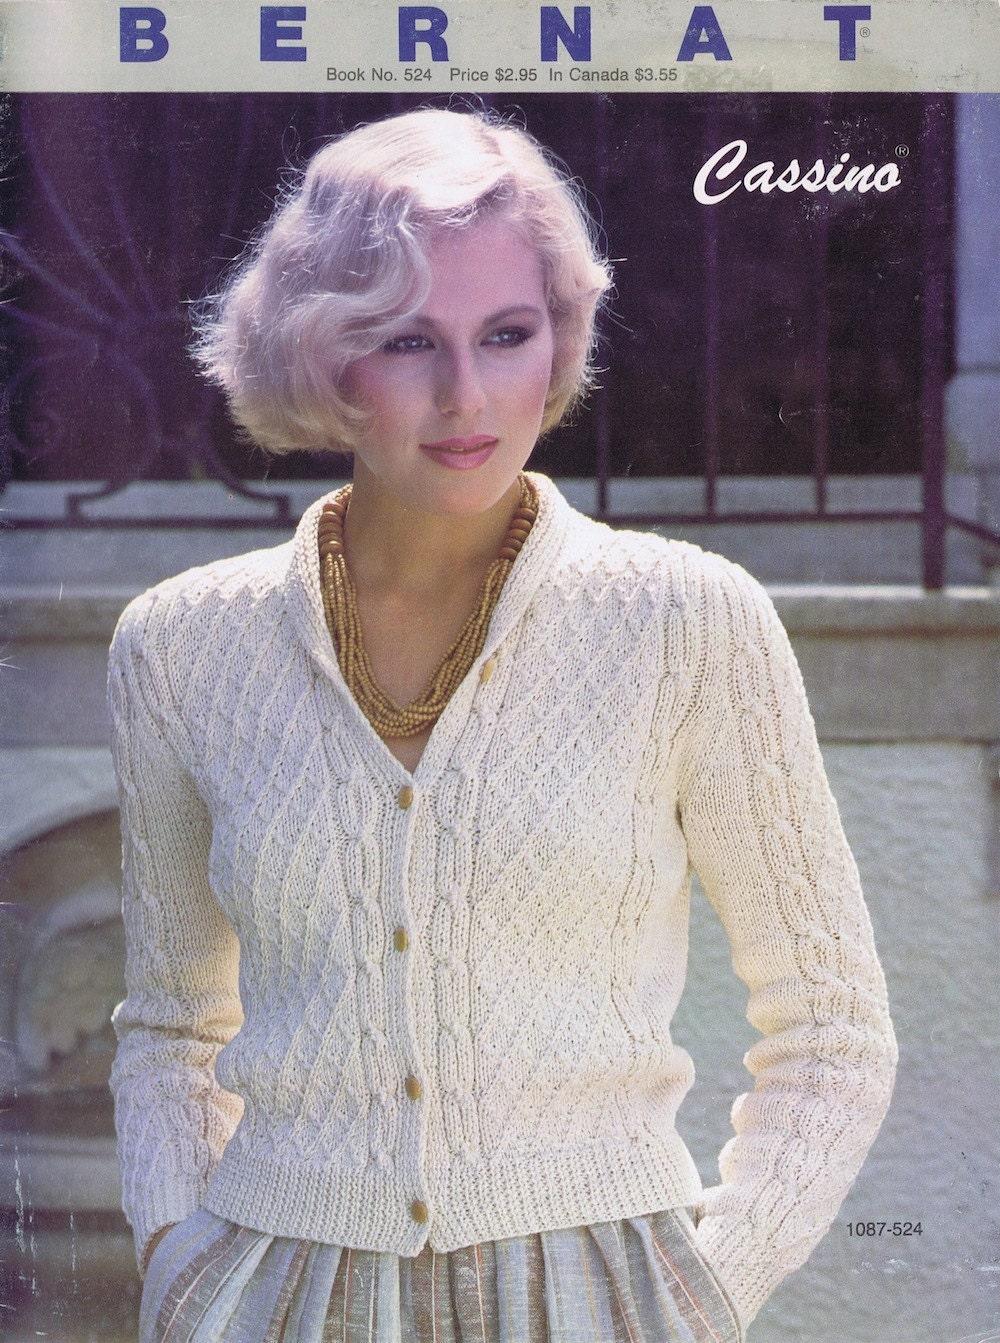 Vintage Knitting Books : Original vintage knitting book by bernat s women